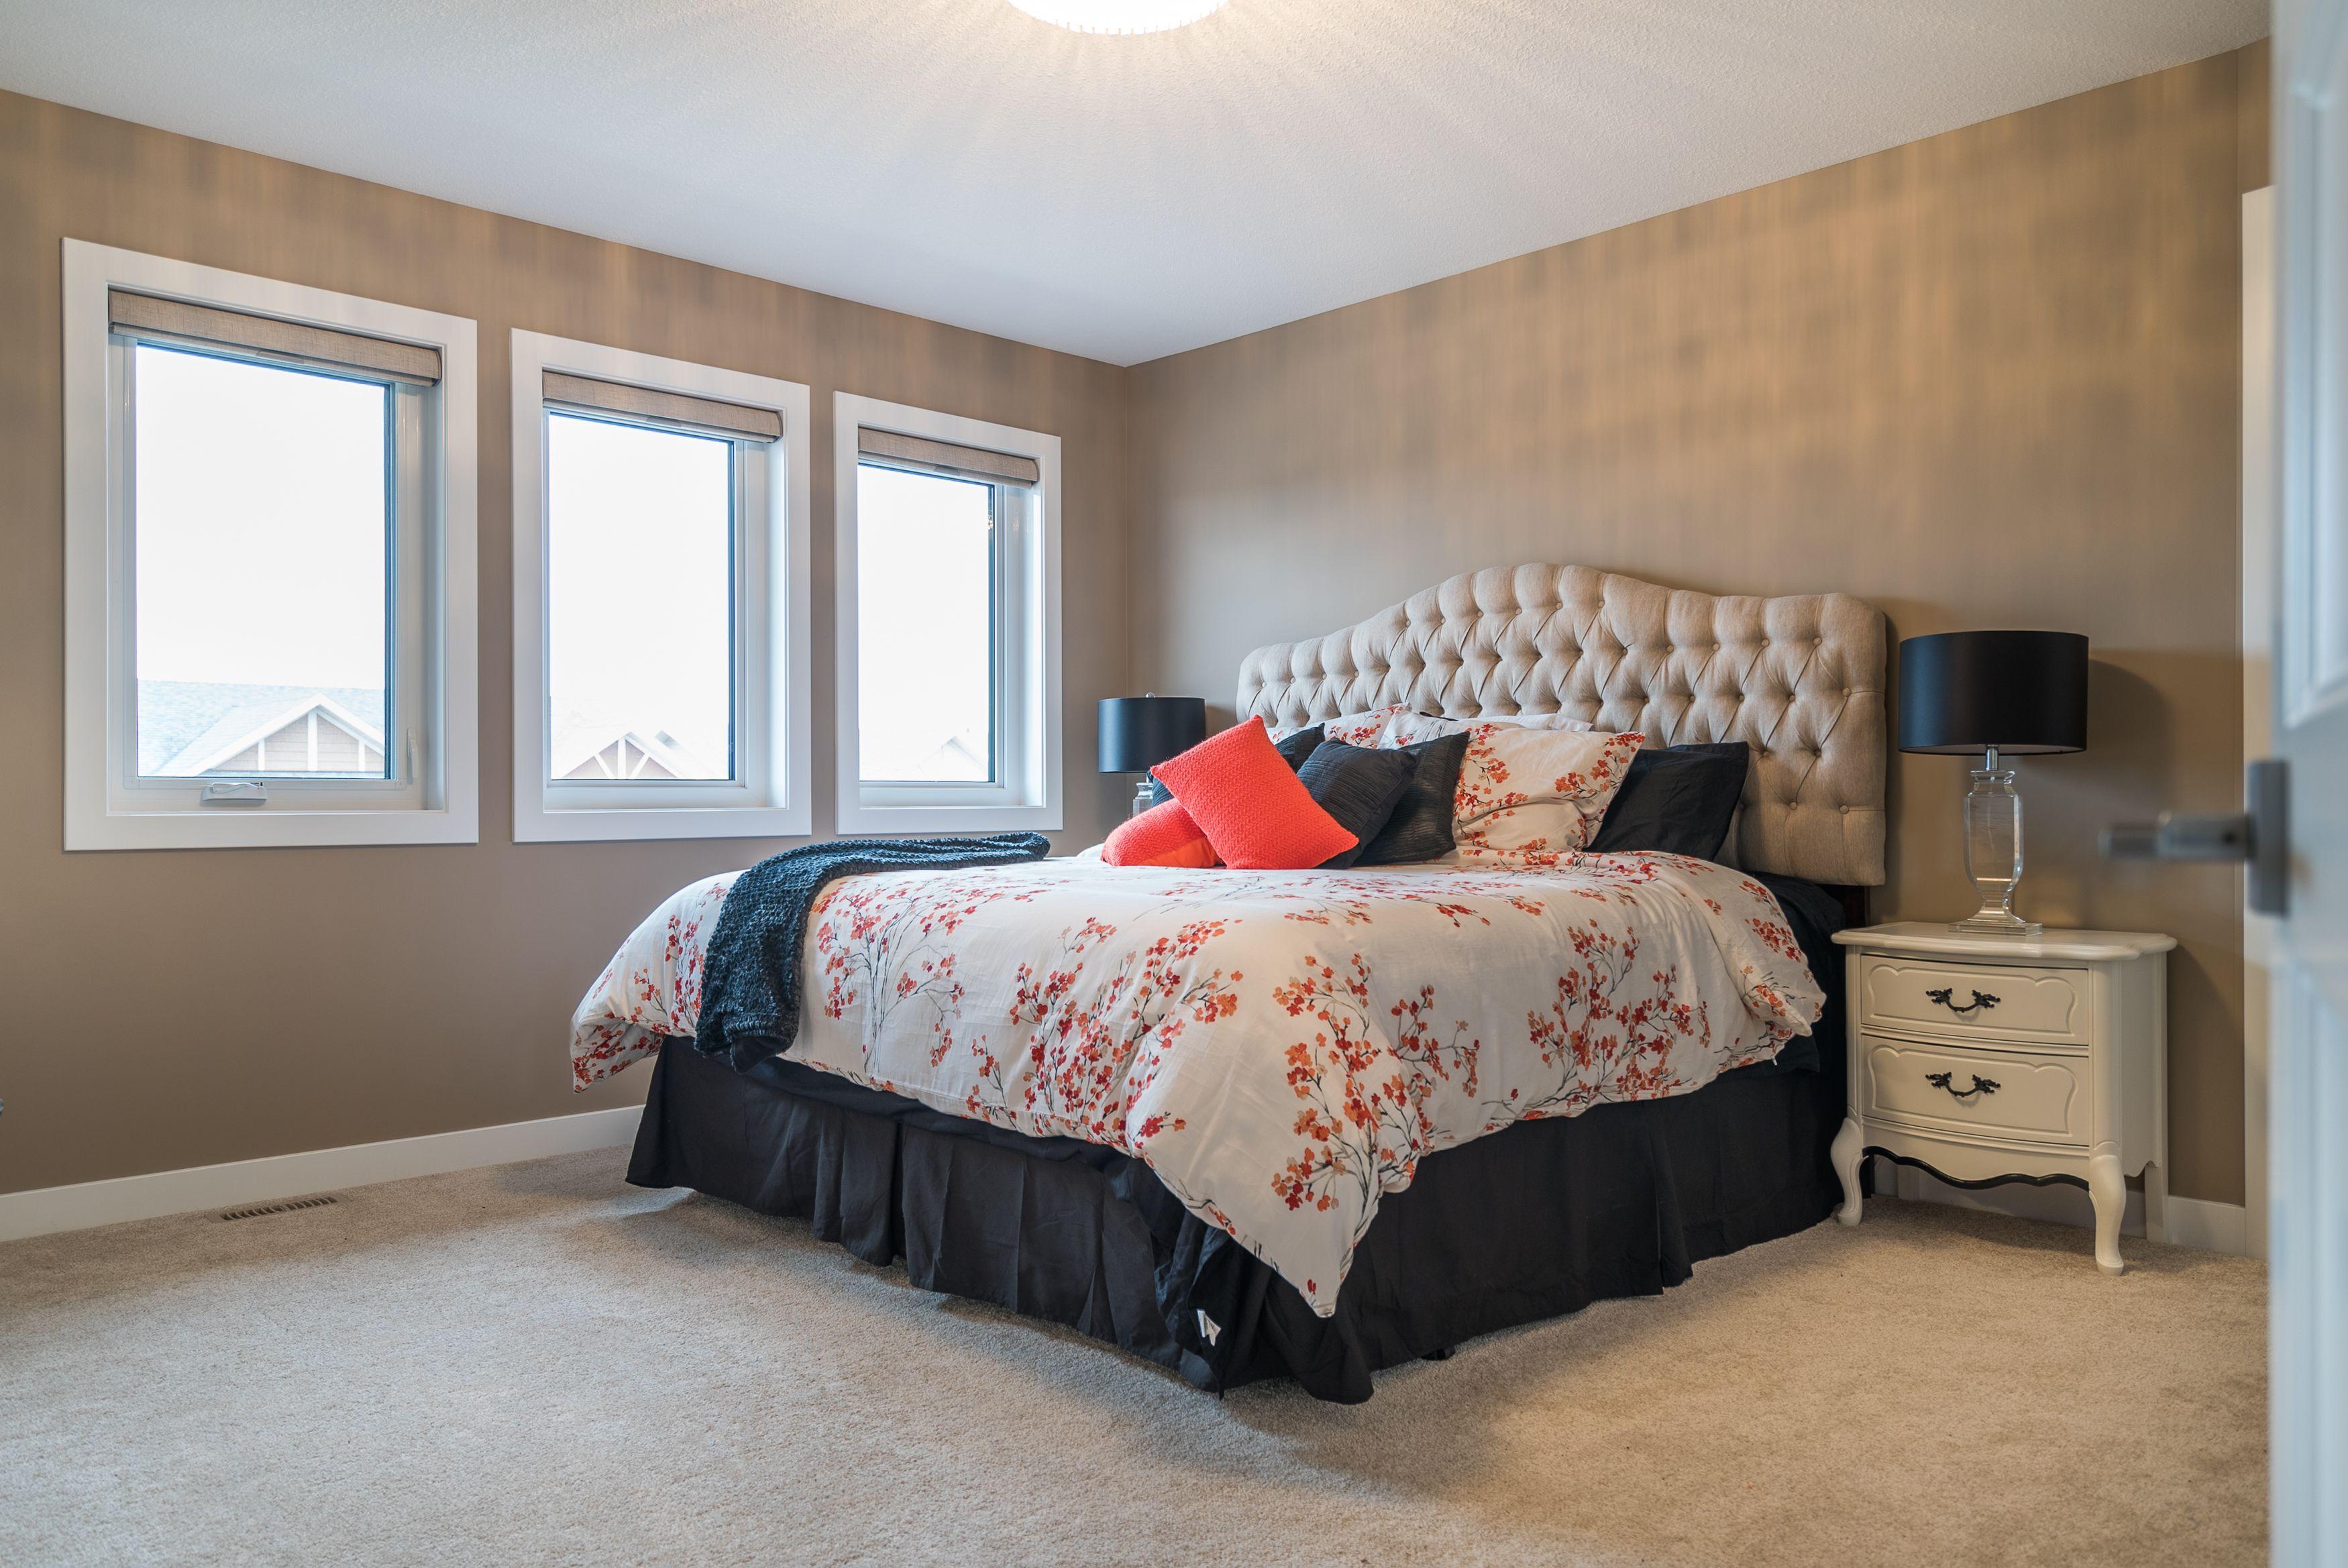 Master bedroom suite decor  Master bedroom modern victorian decor  Bedrooms  Pinterest